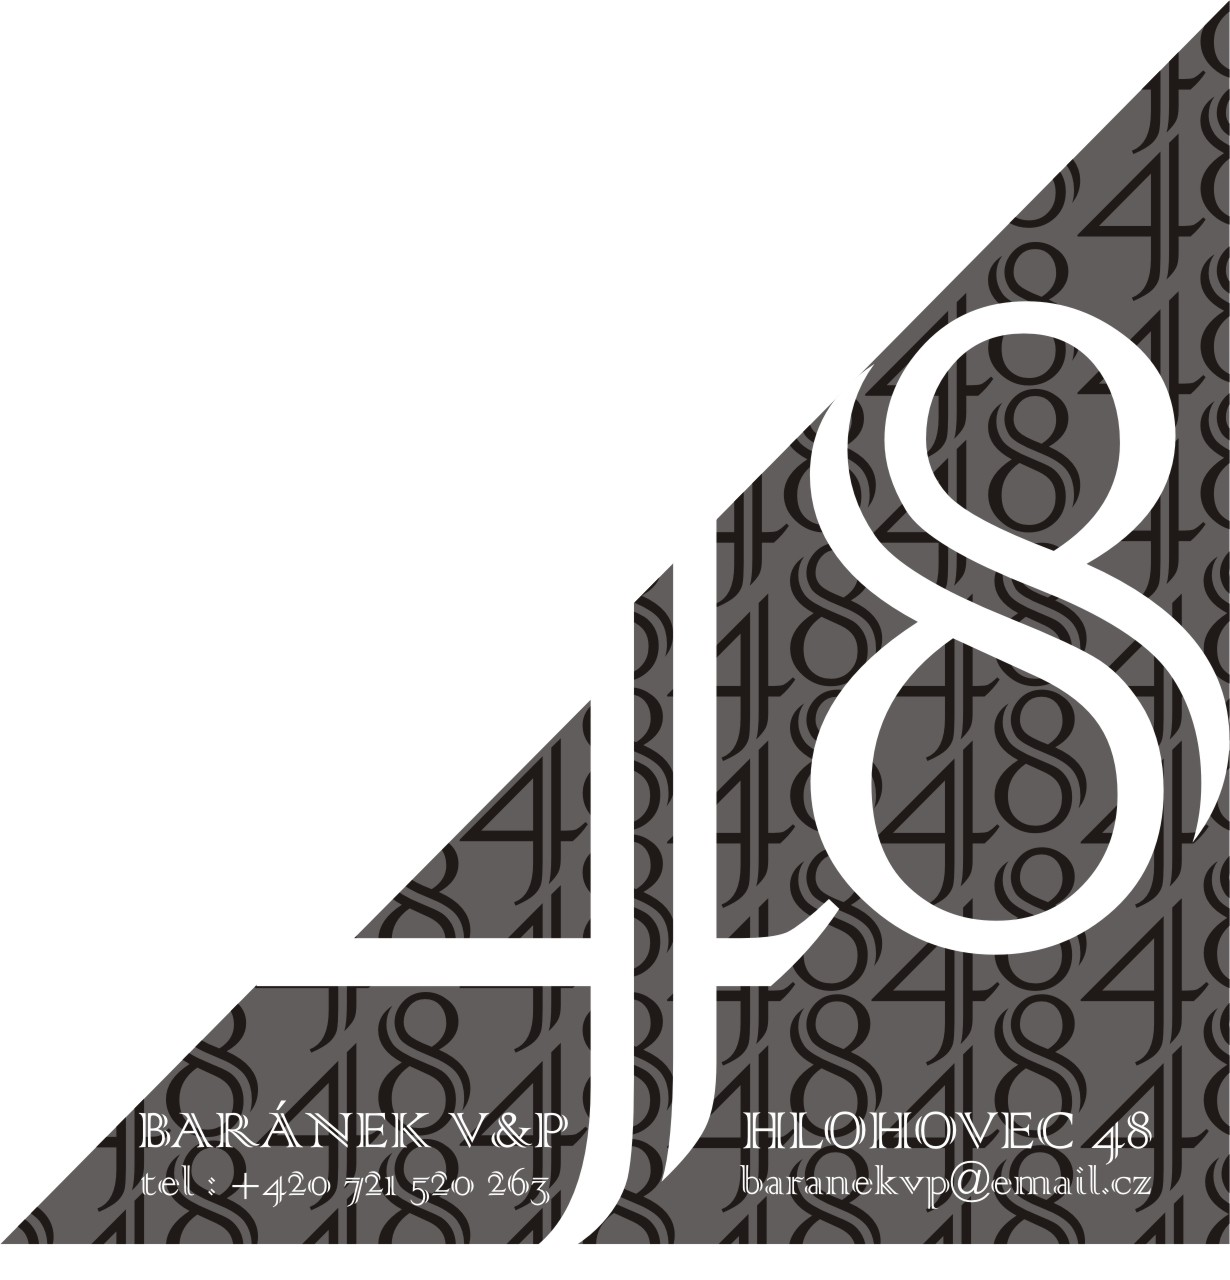 pavel baránek logo.jpg